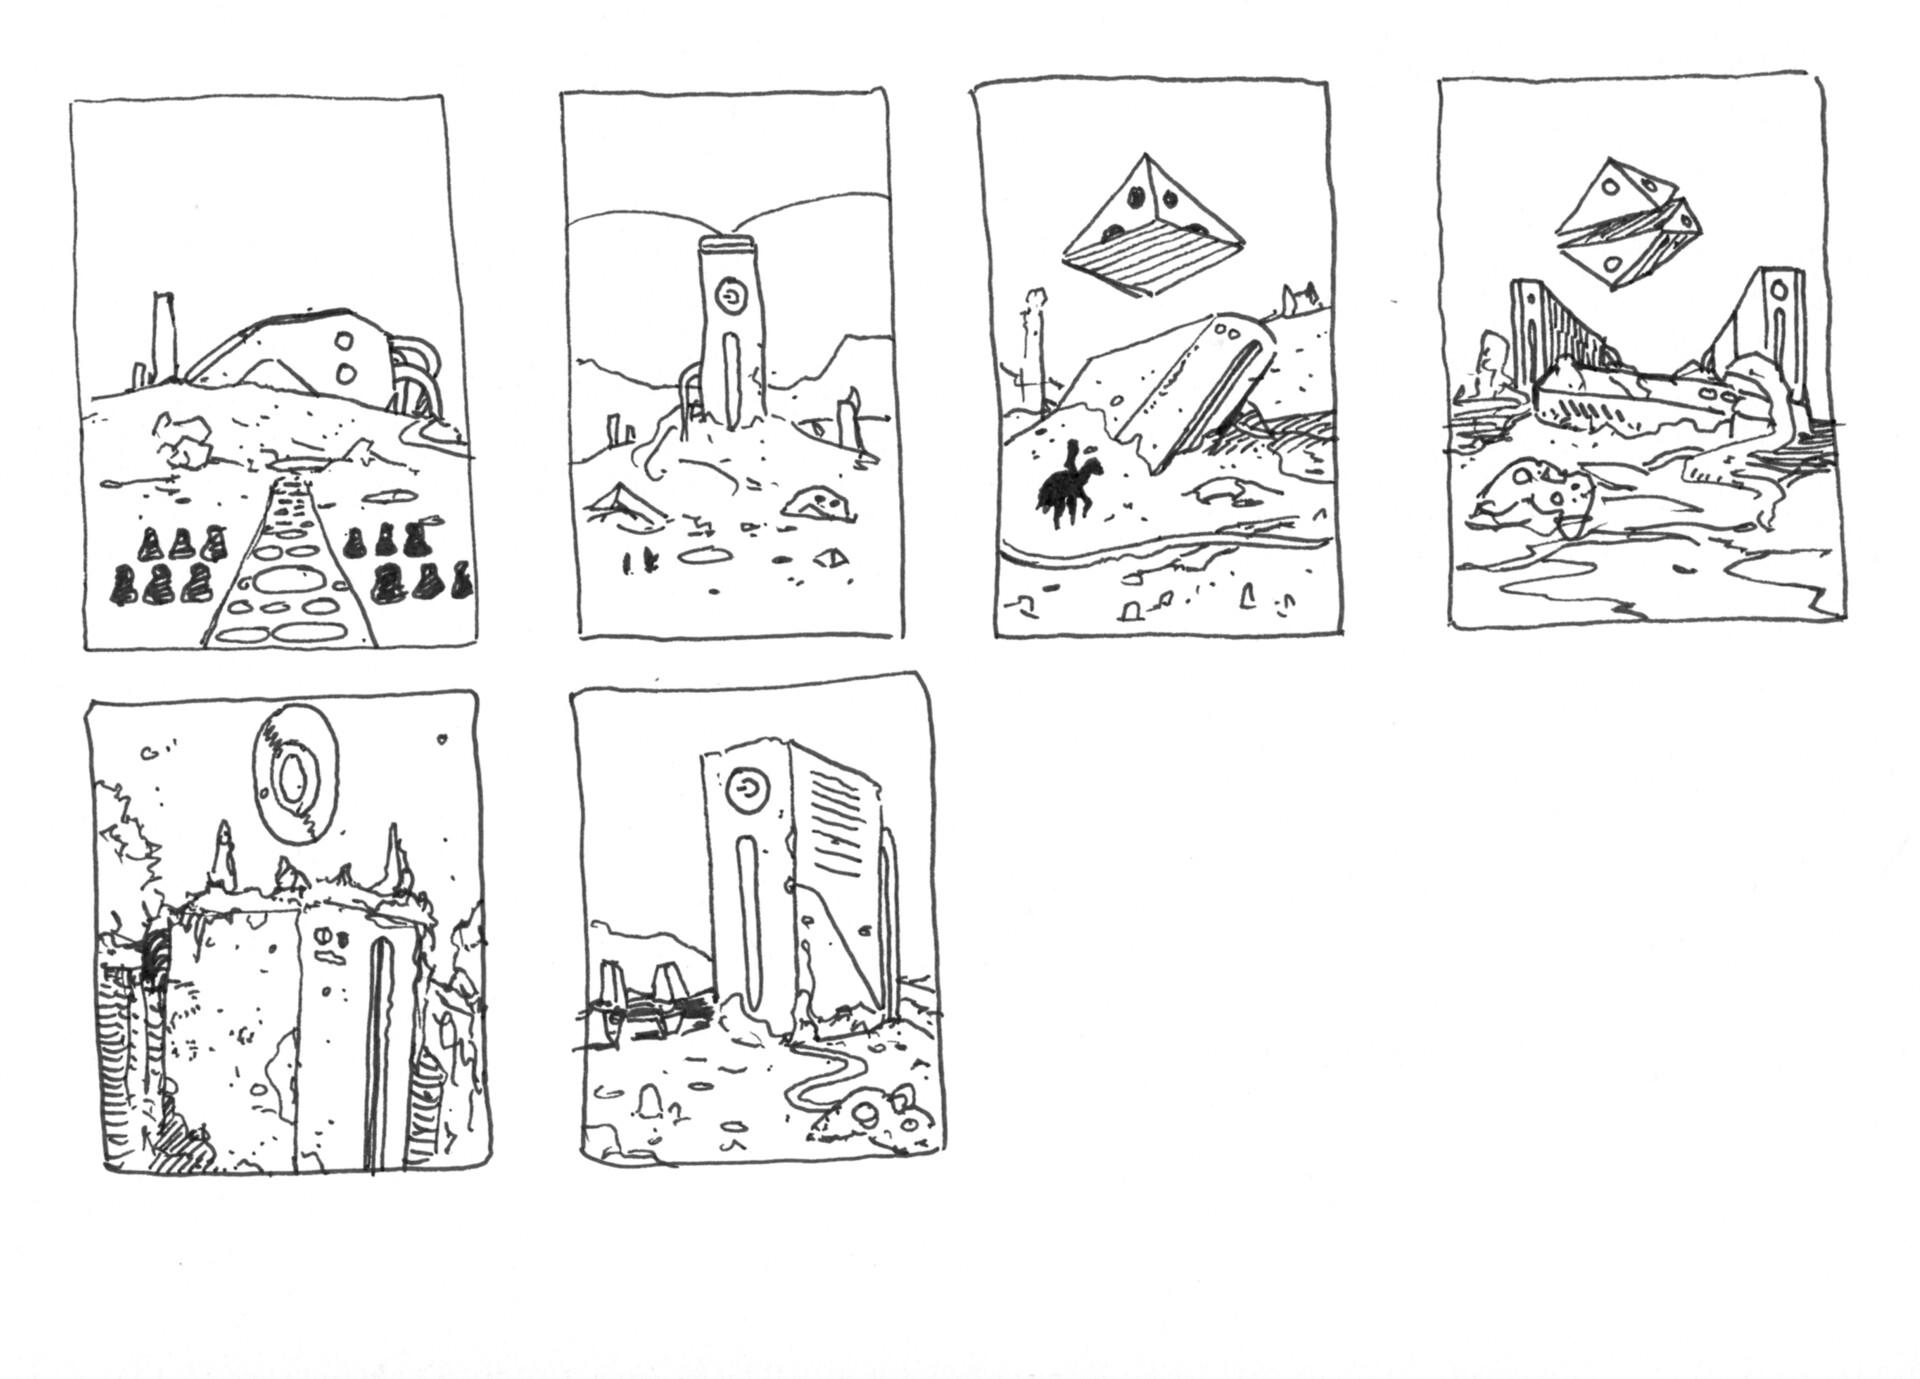 Christian herman sketches